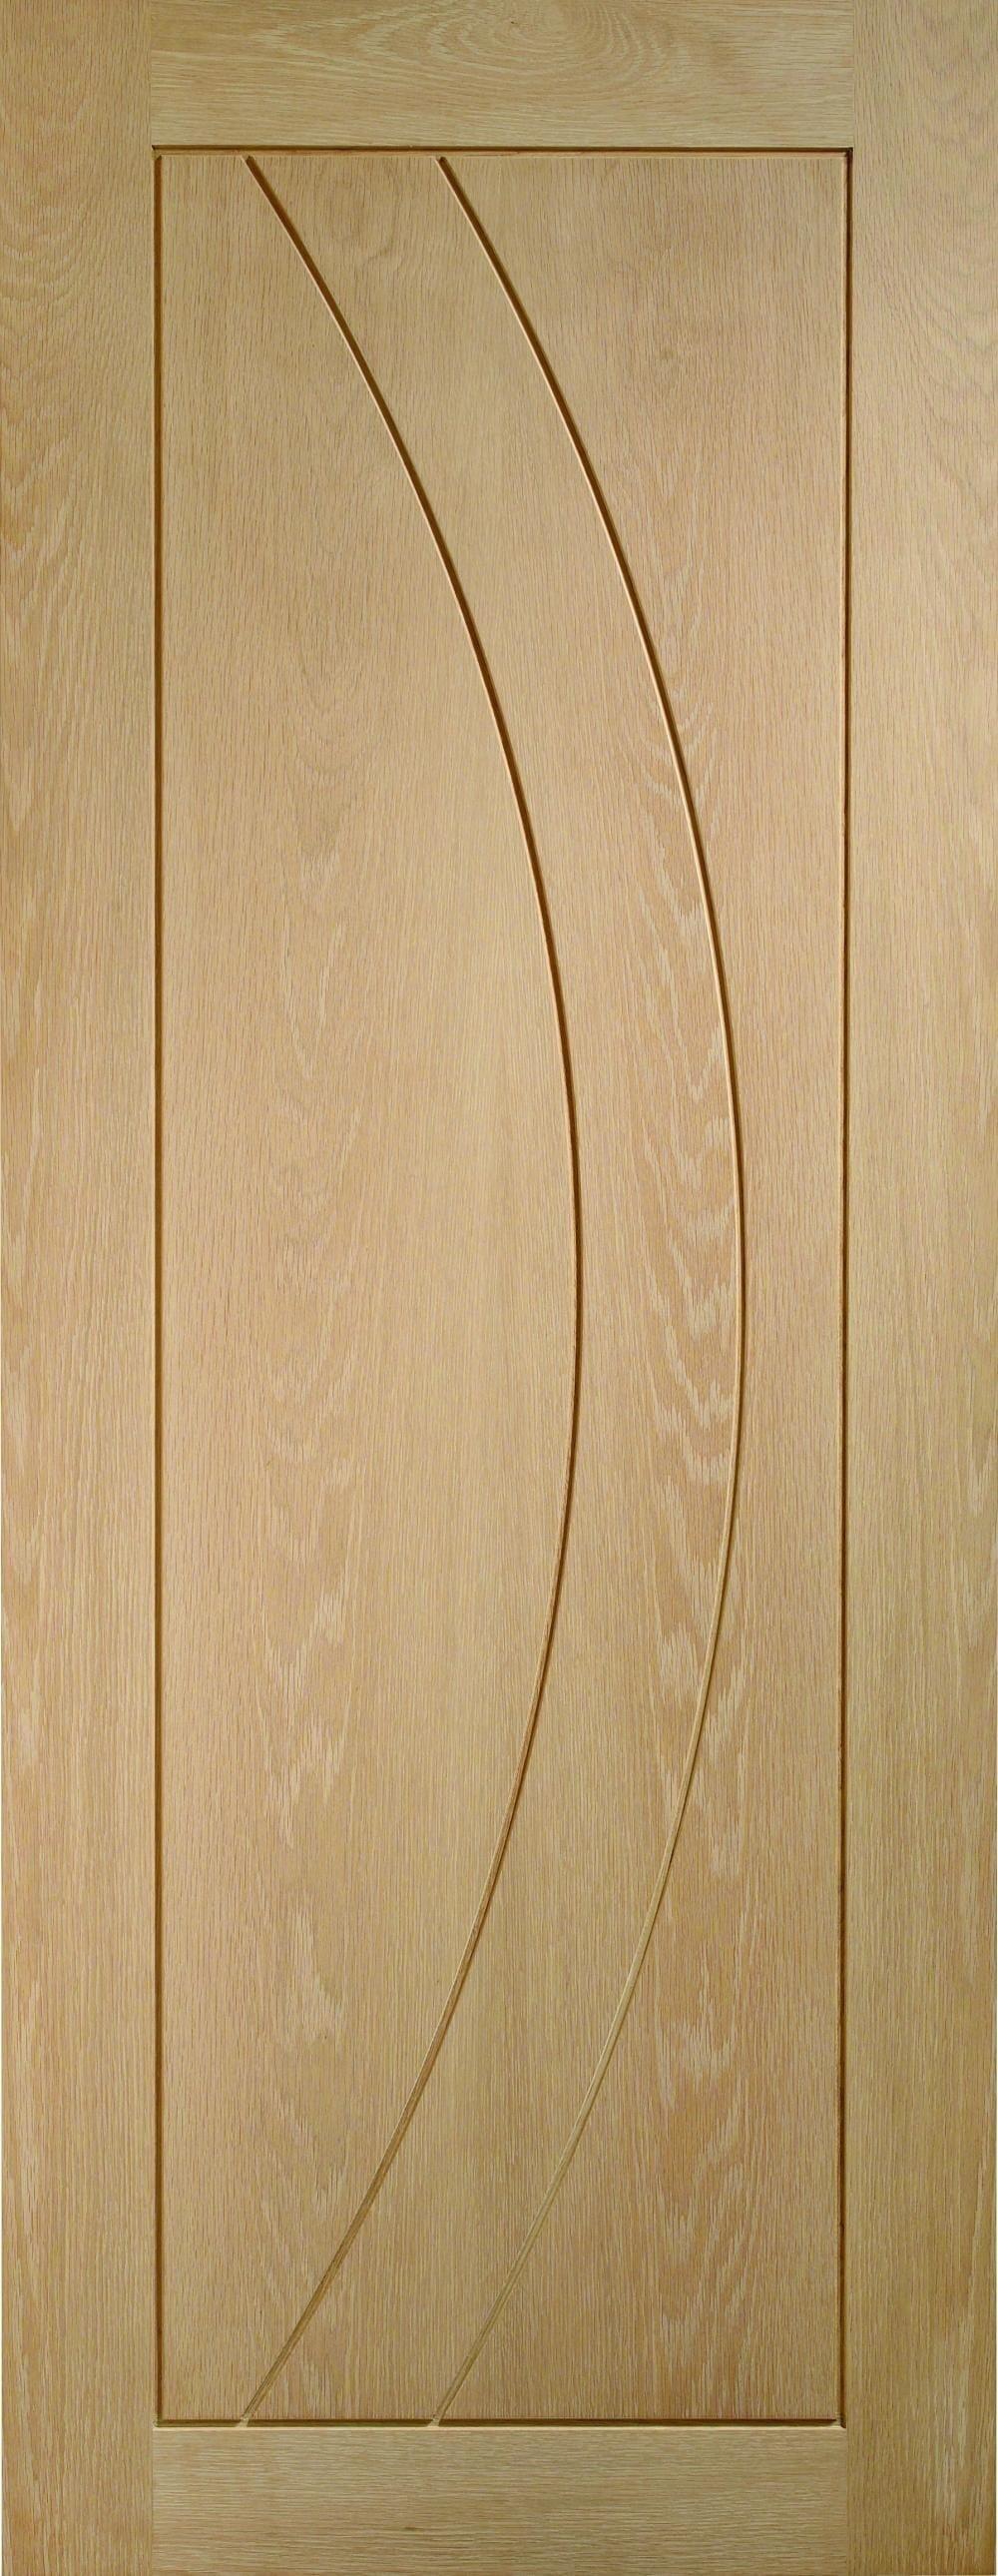 Salerno Oak - Prefinished  Image